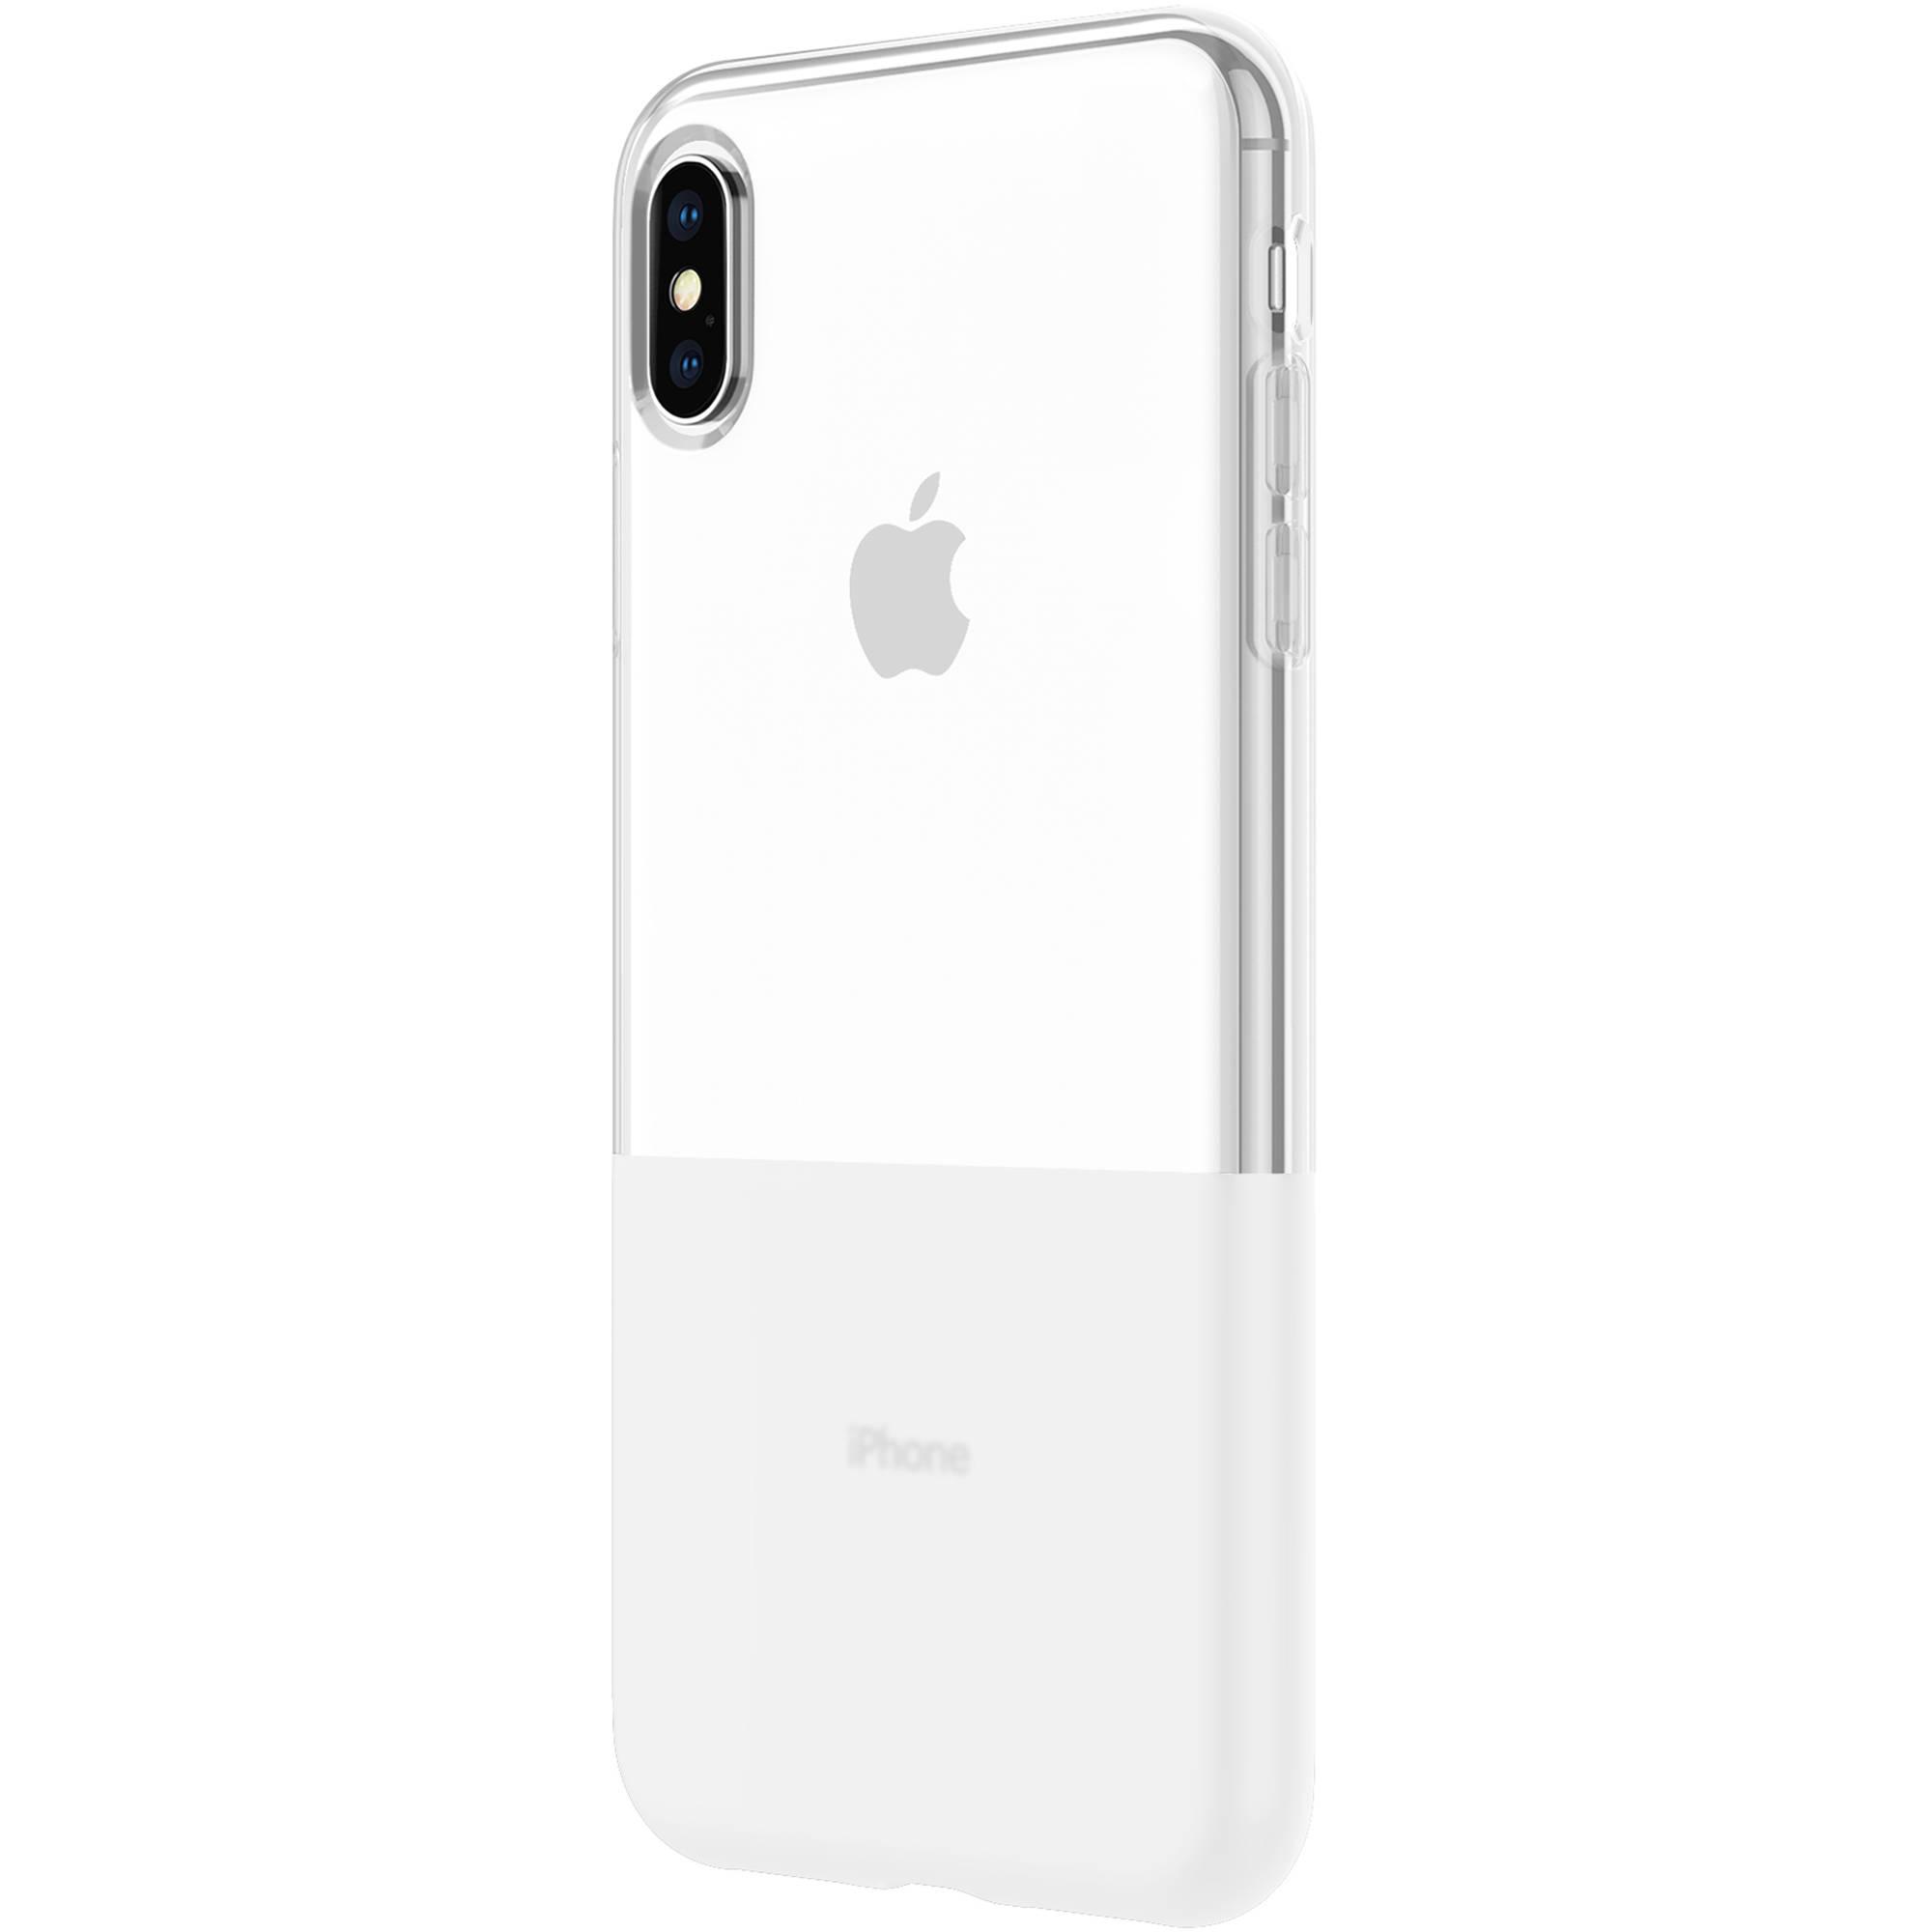 half off f78c0 a974a Incipio NGP Case for iPhone Xs Max (Clear) IPH-1760-CLR B&H